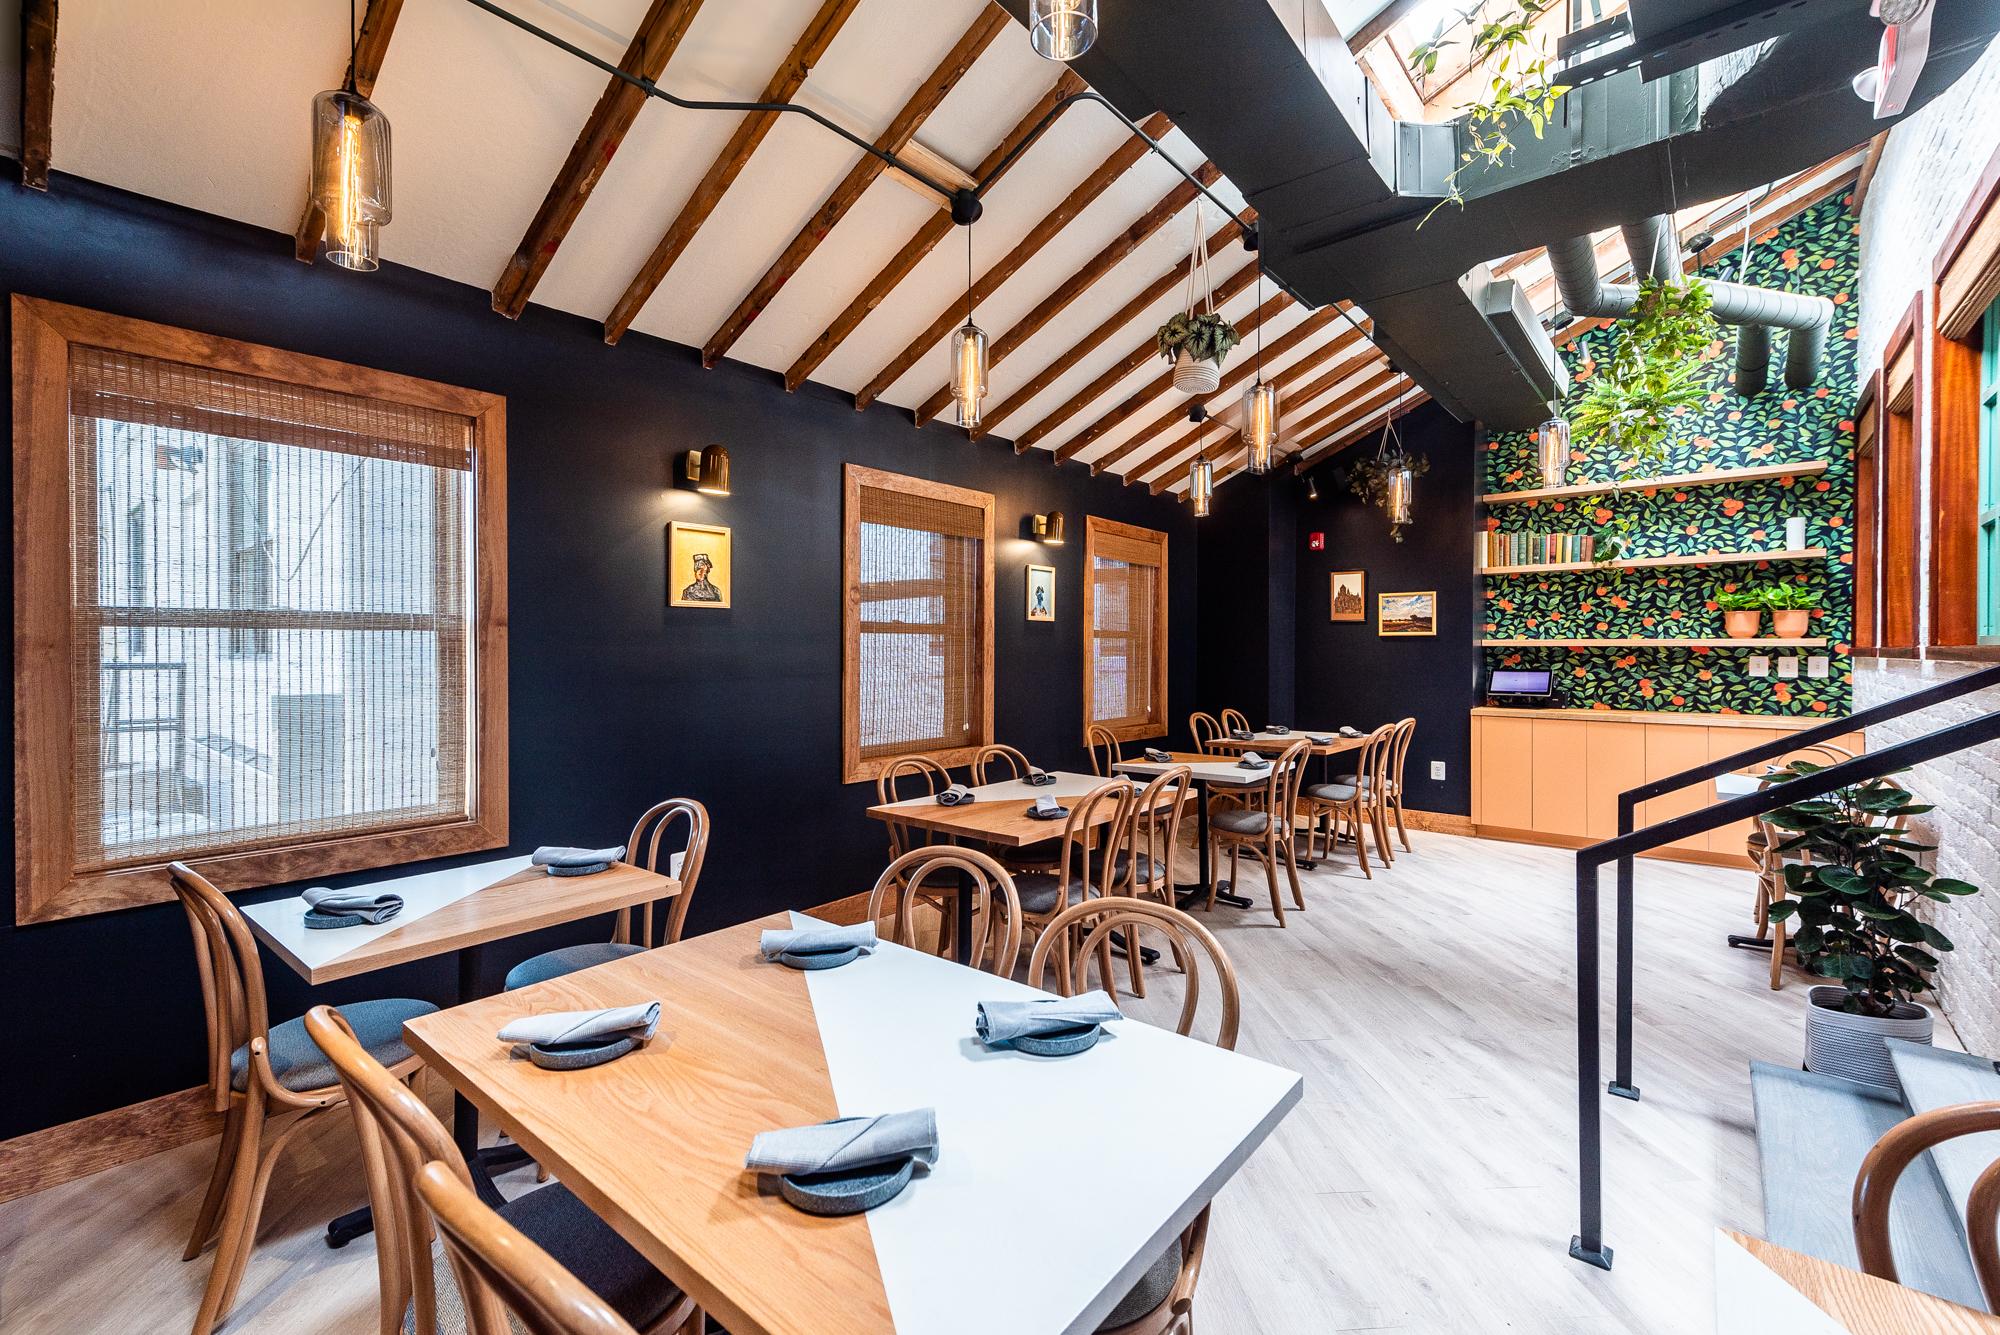 The upstairs dining room at Anju